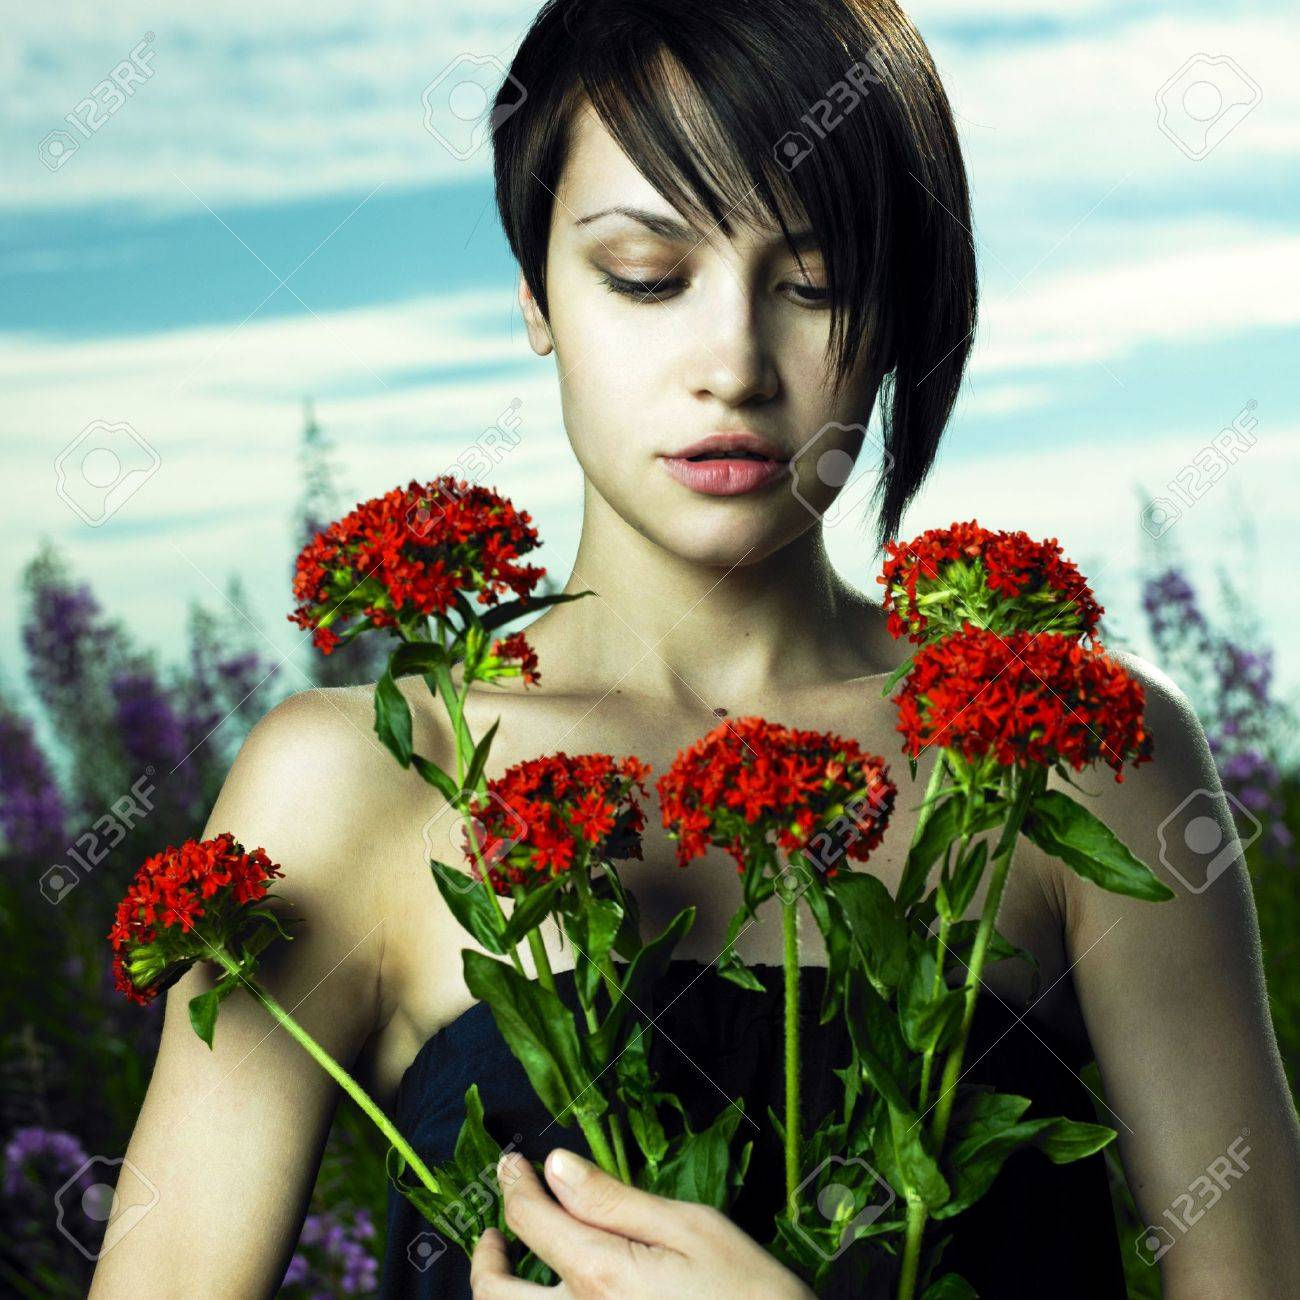 Portrait of romantic girl in flower meadow Stock Photo - 8105849